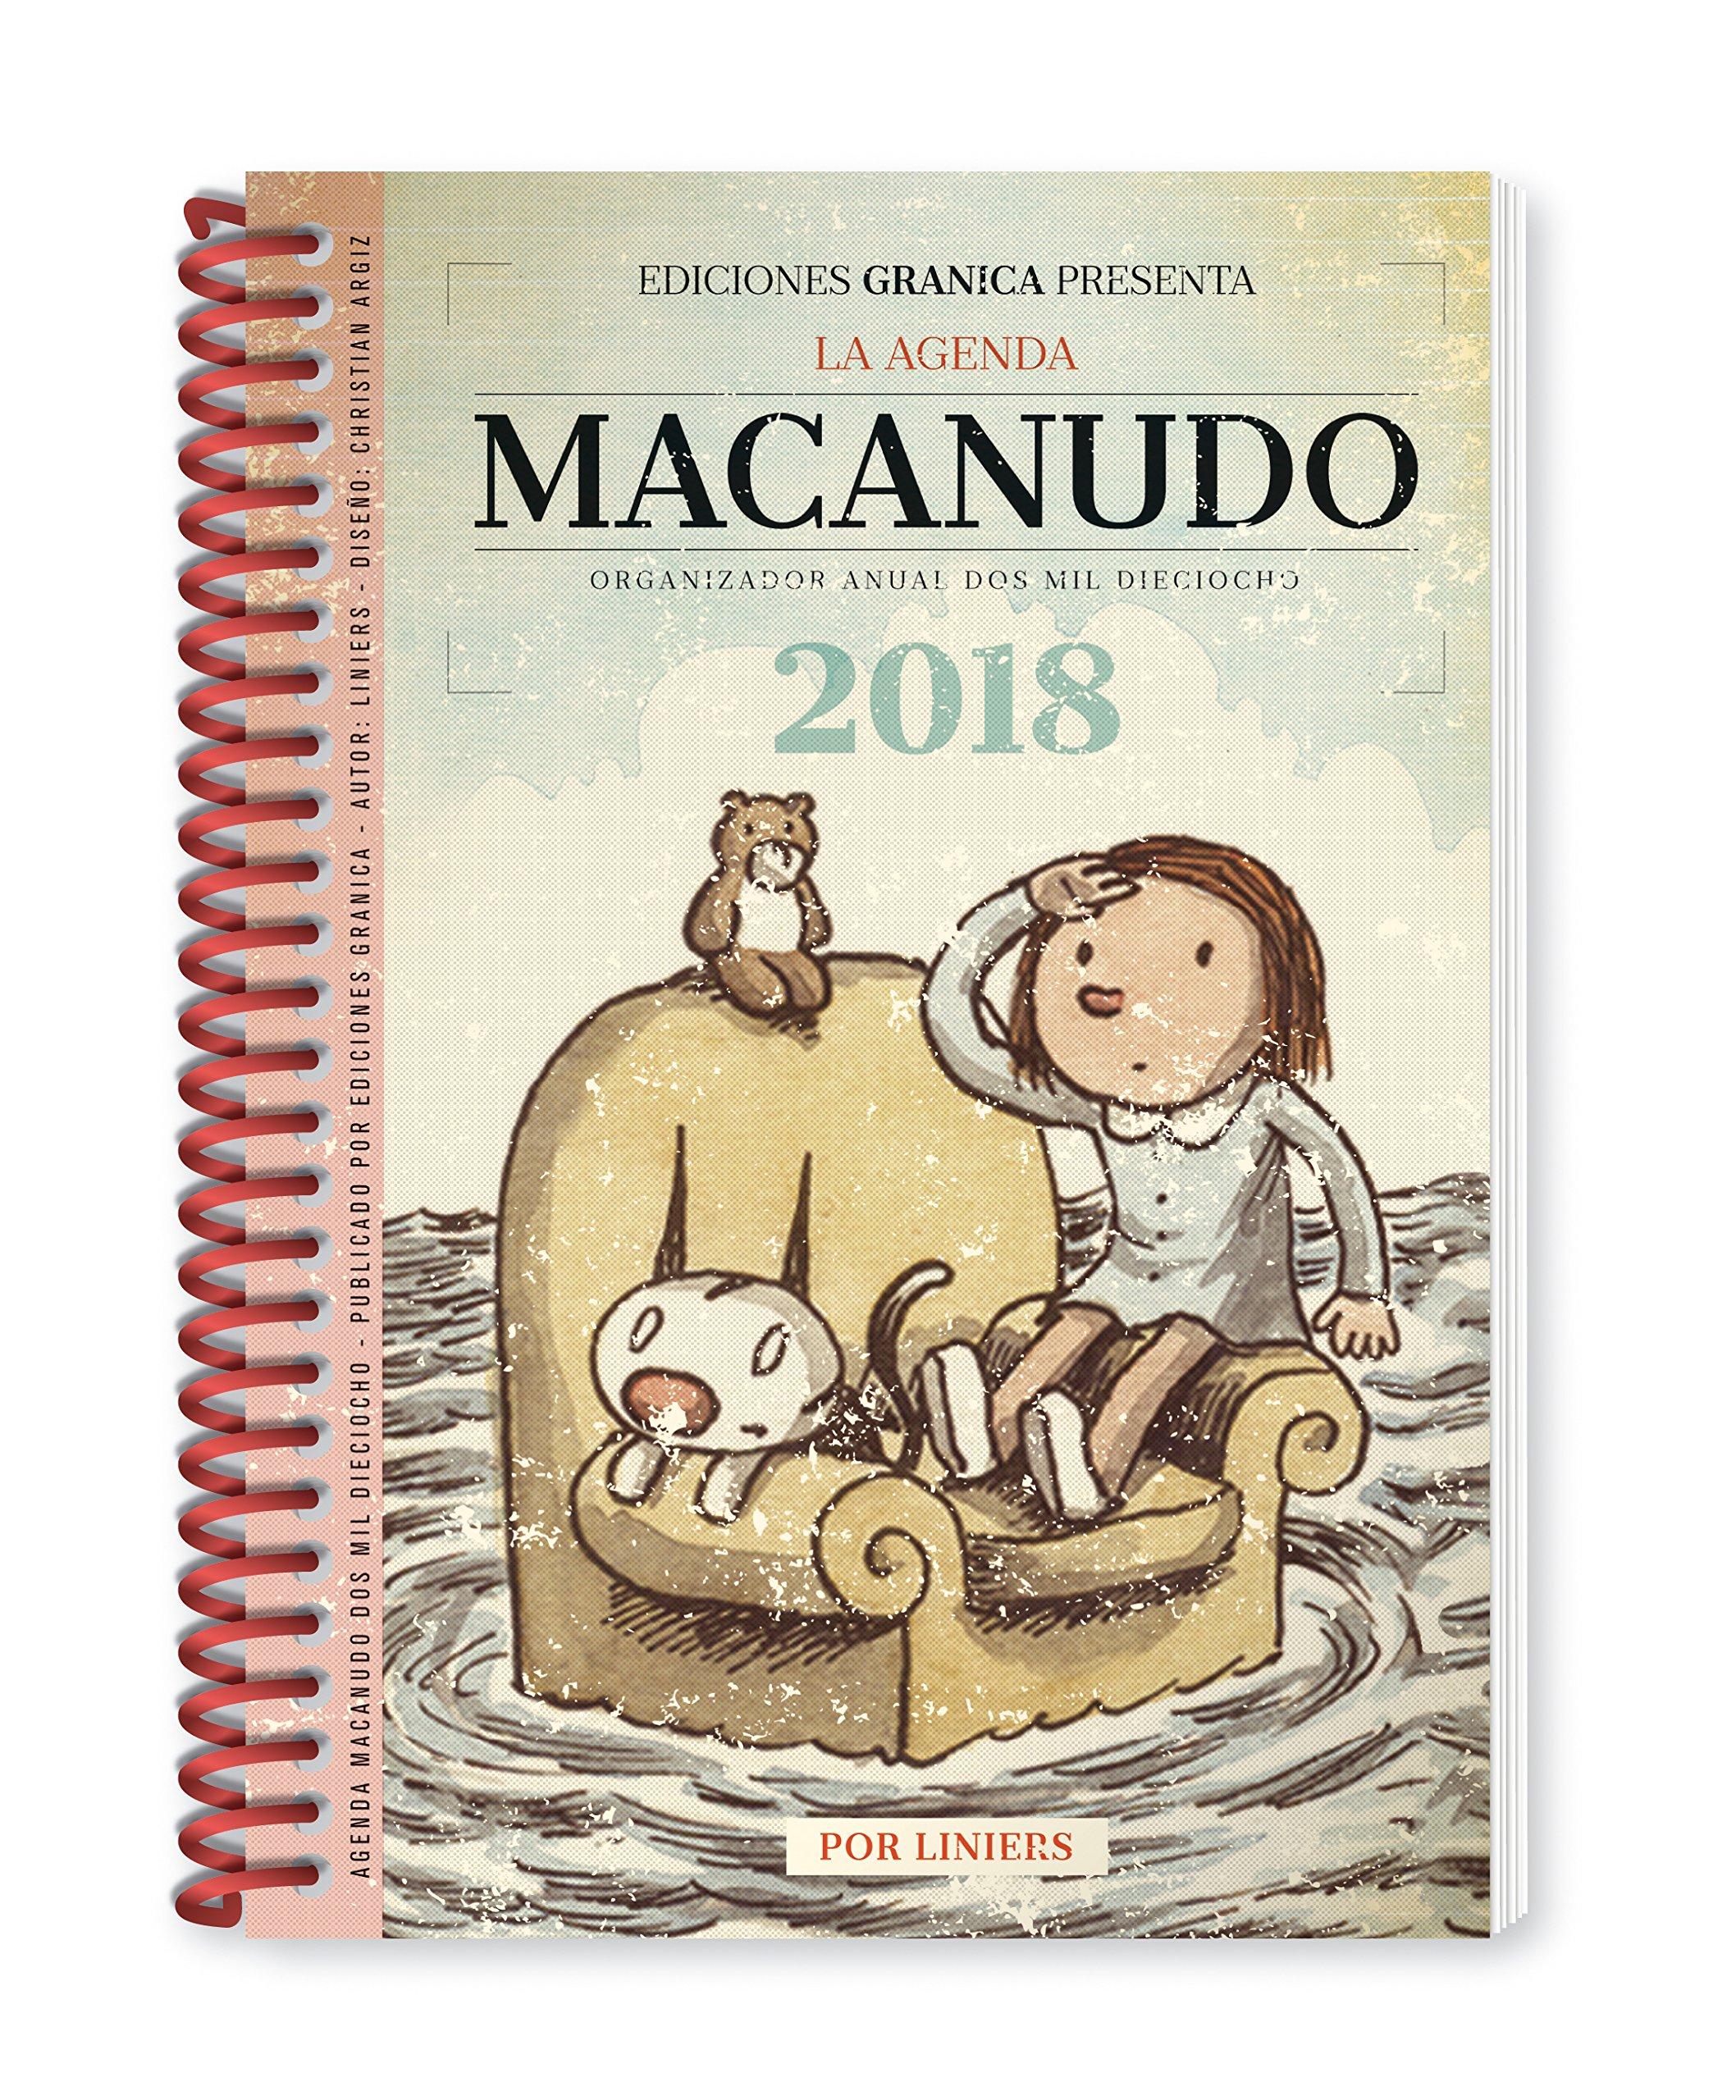 Macanudo 2018 Agenda anillada - Enriqueta: Liniers ...